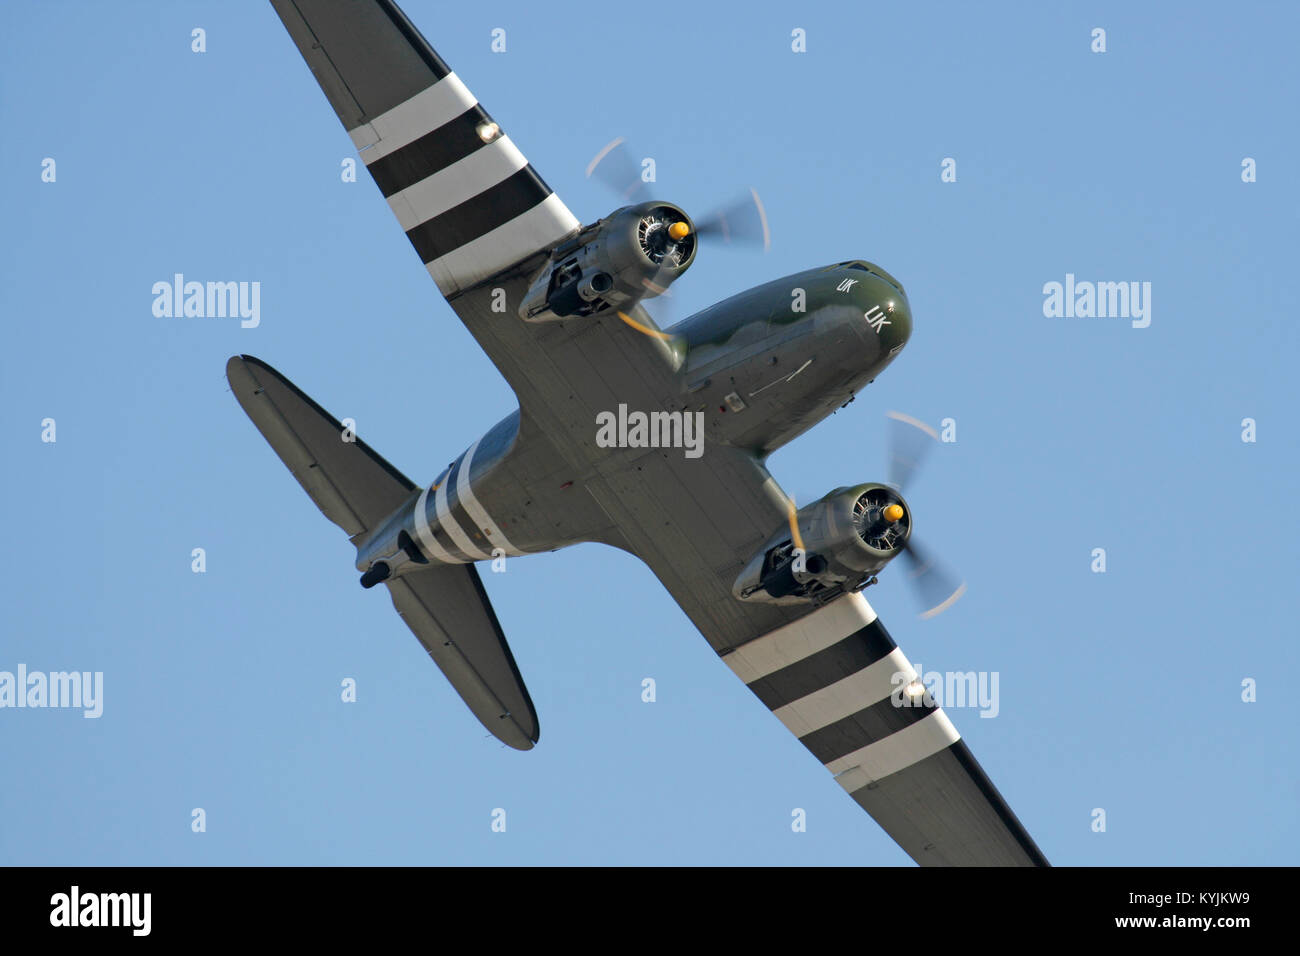 C-47 Skytrain (DC-3 Dakota) vintage plane of the Royal Air Force Battle of Britain Memorial Flight in an air display - Stock Image